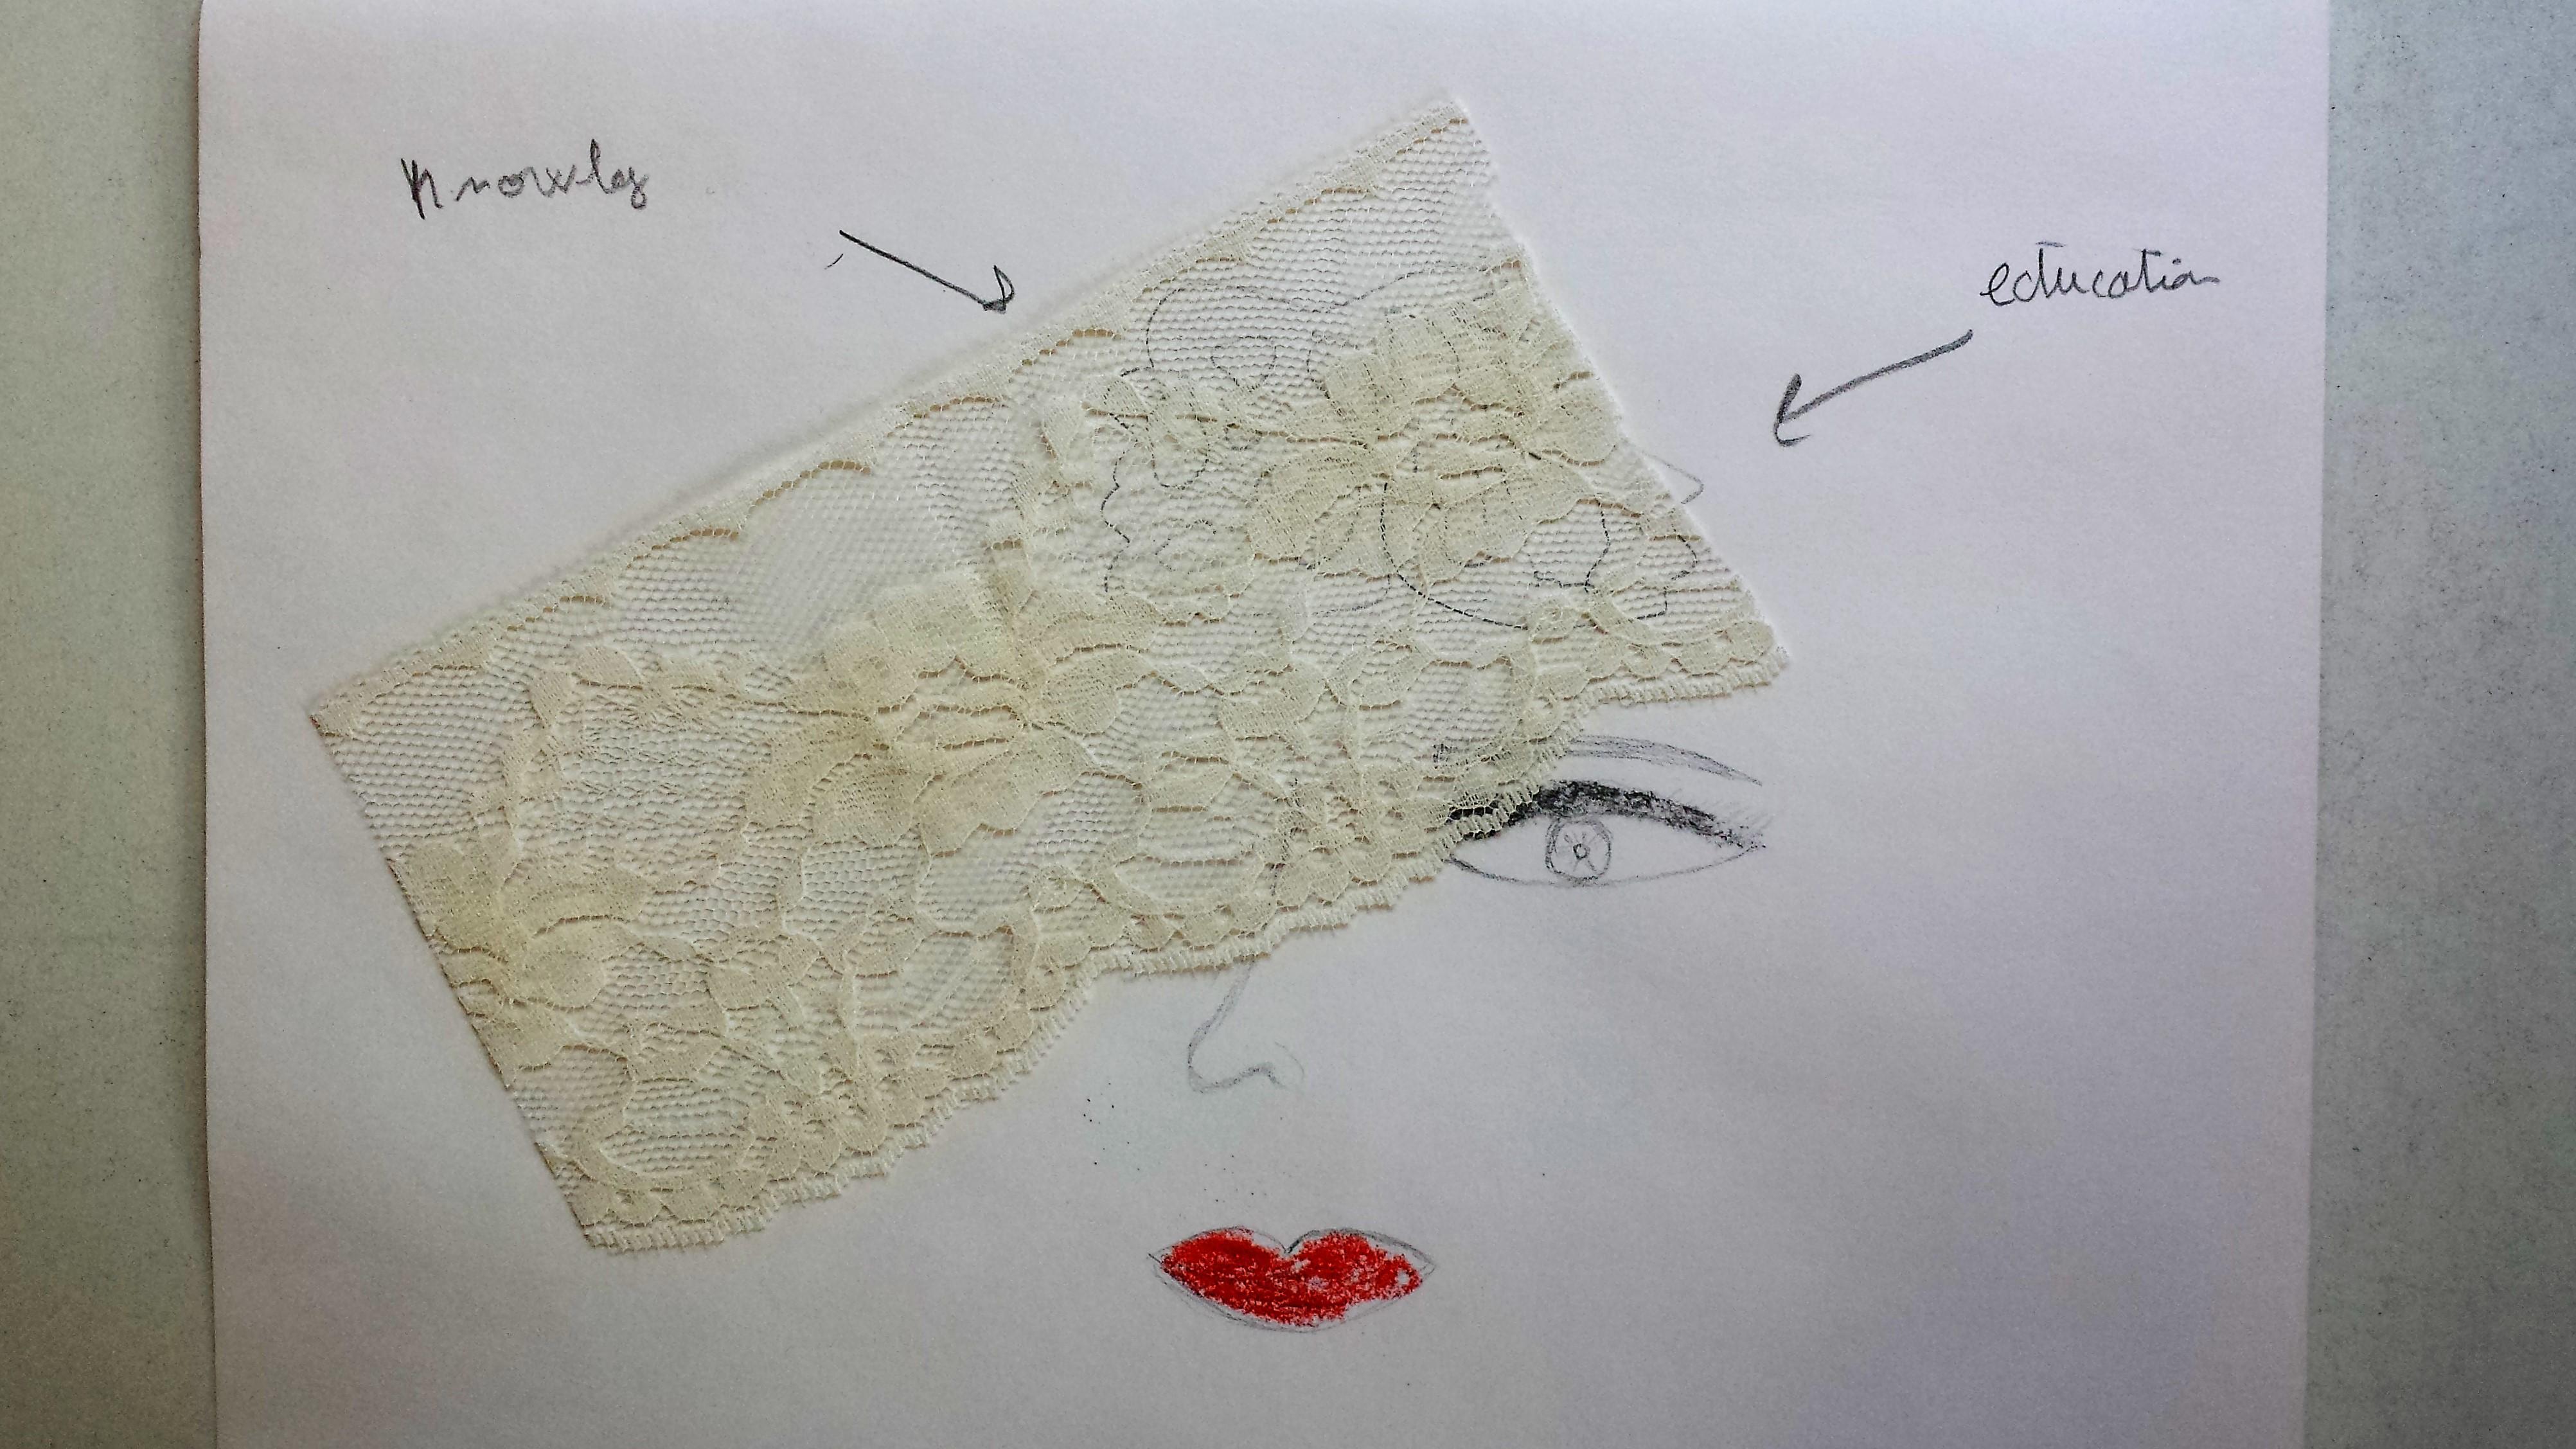 lindsay-hbv-artwork